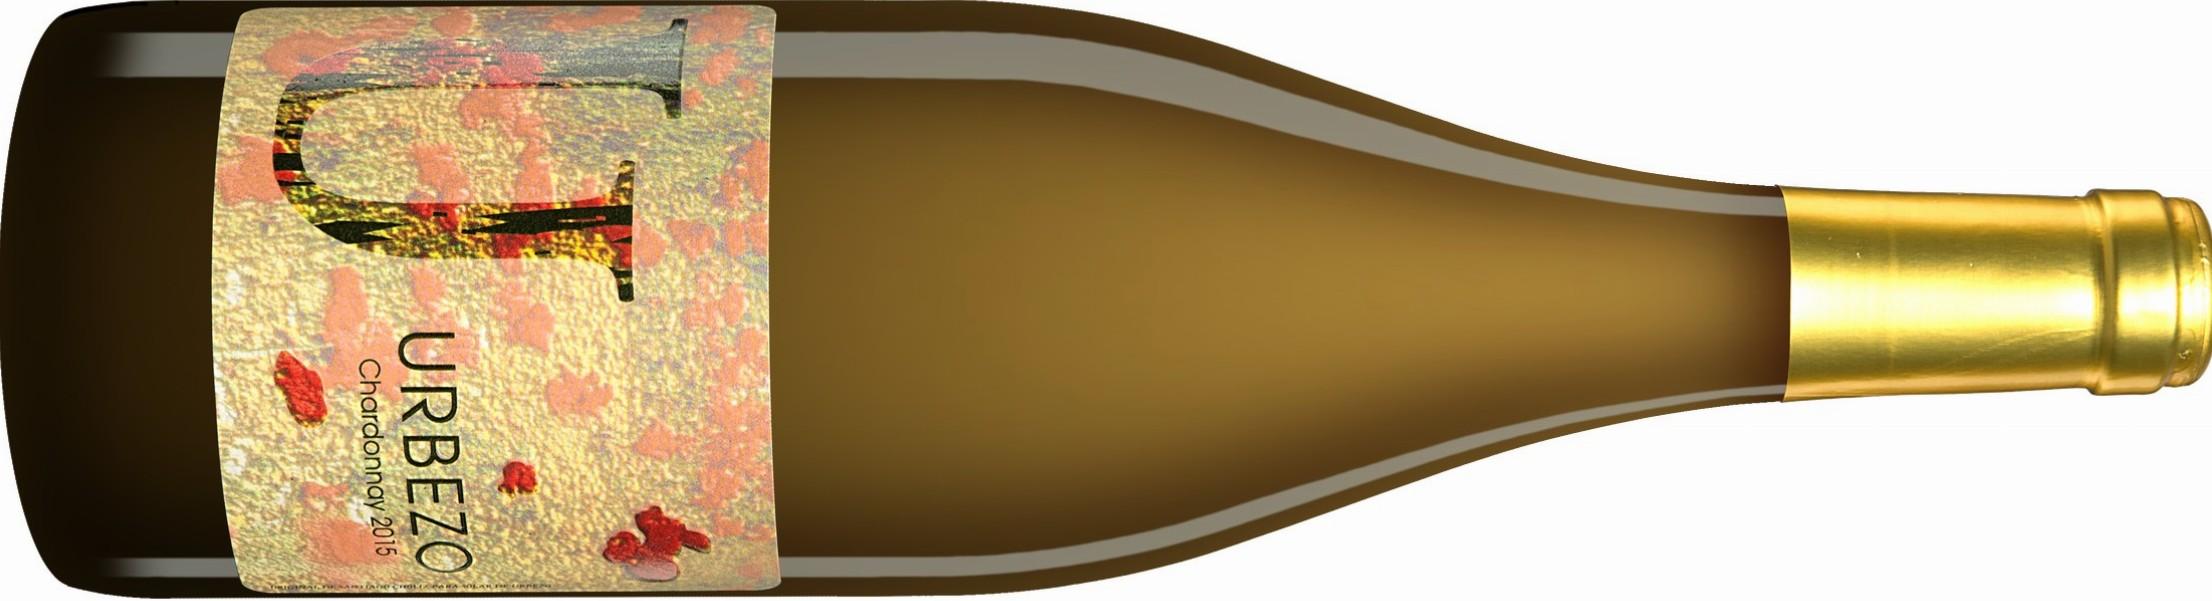 Urbezo Chardonnay Ecologico 2014